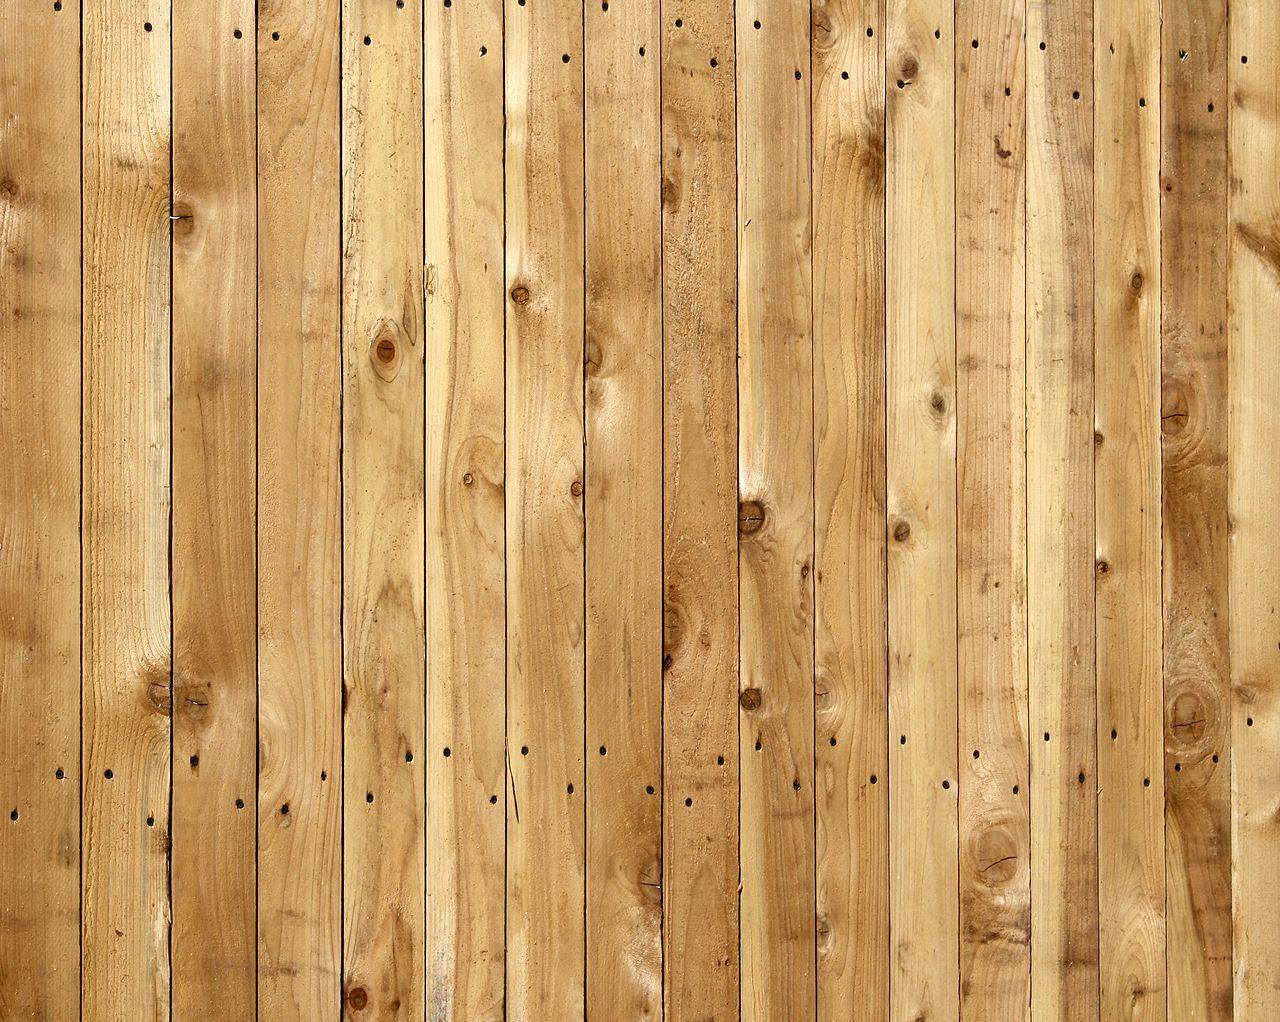 Wood Panel Wallpaper Dining Room